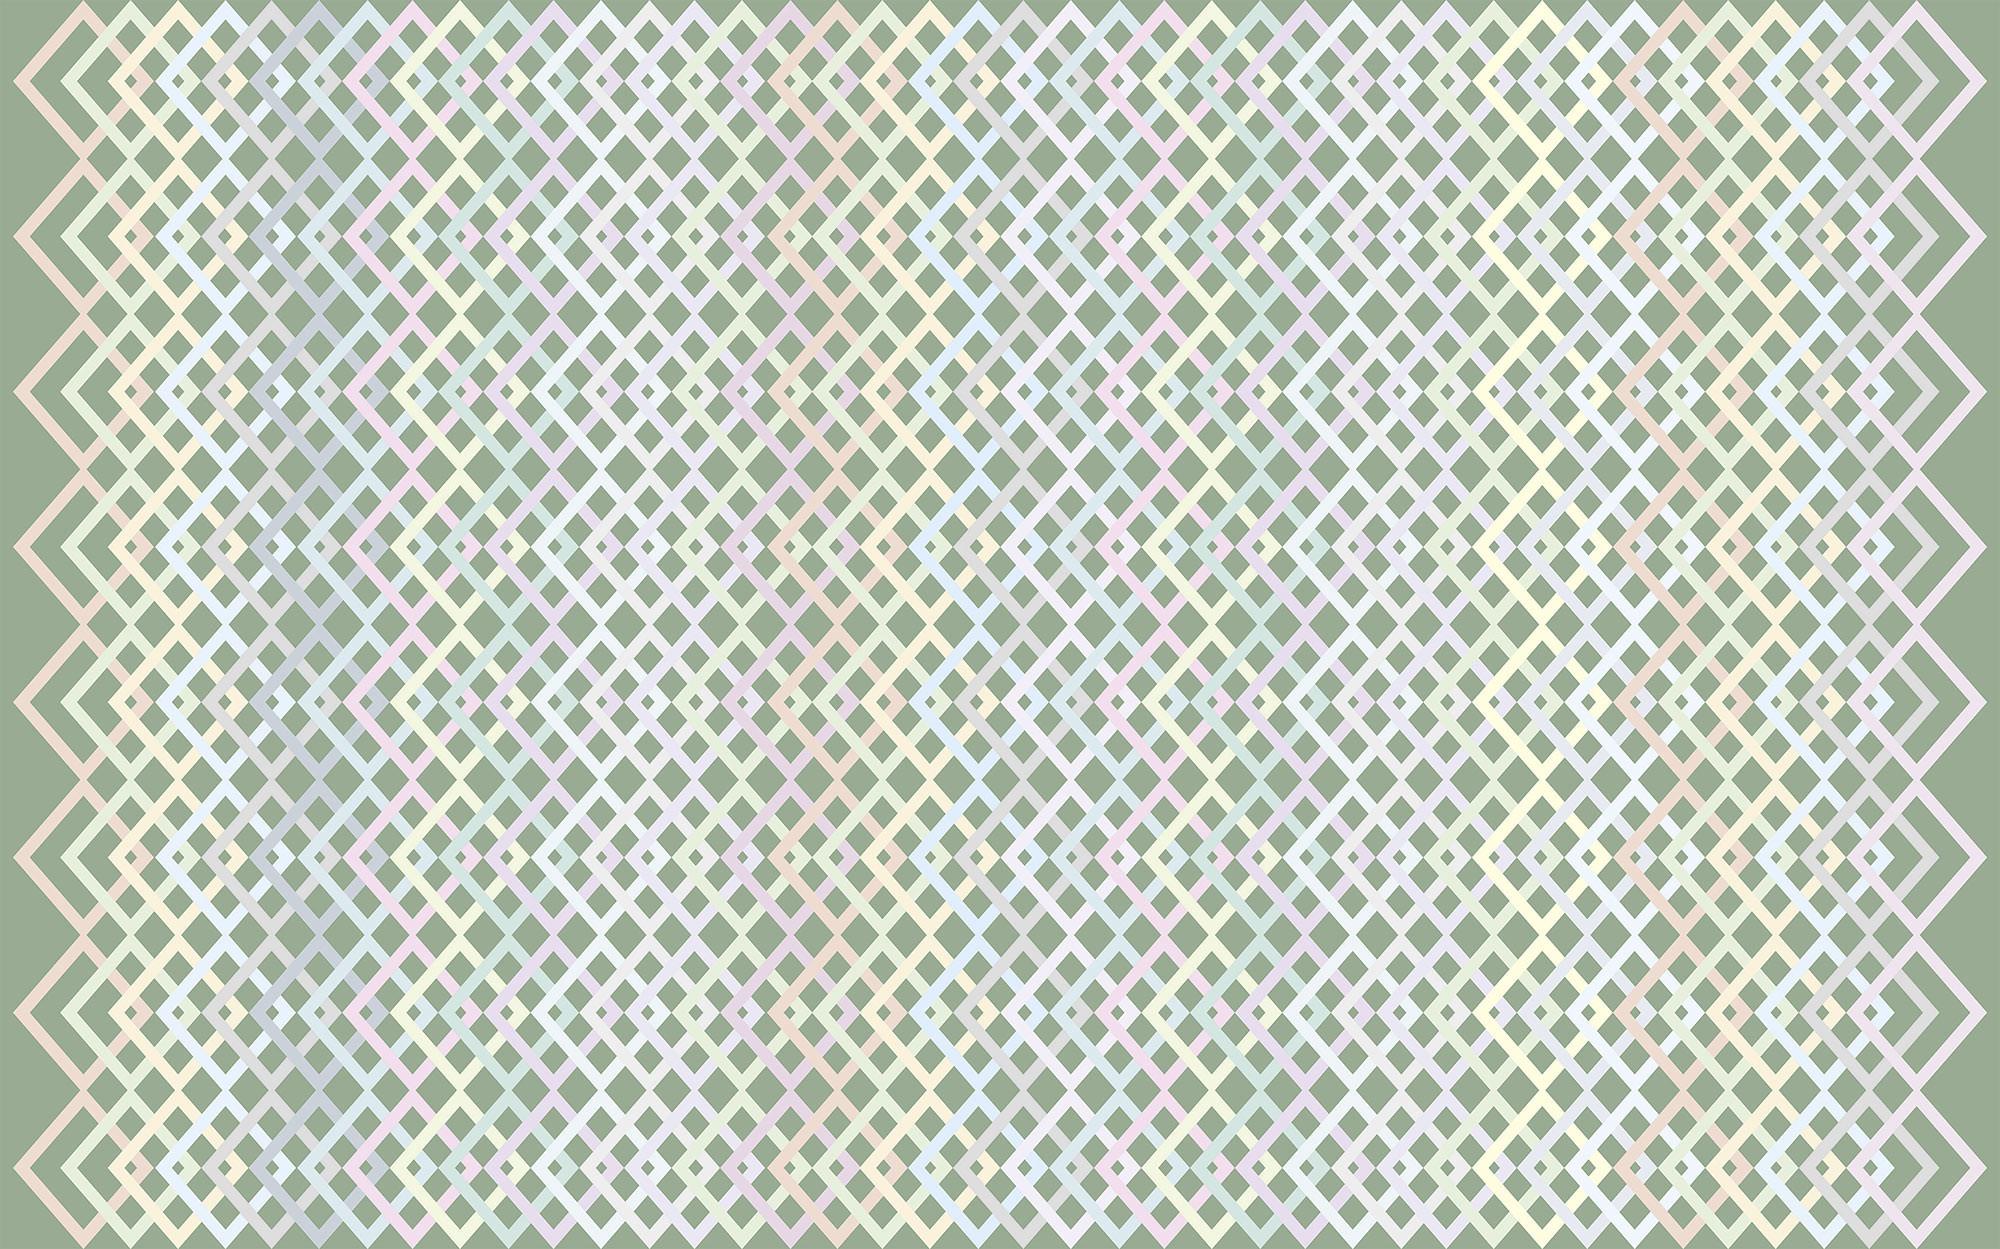 Structure Rhombus greygreen-pastell